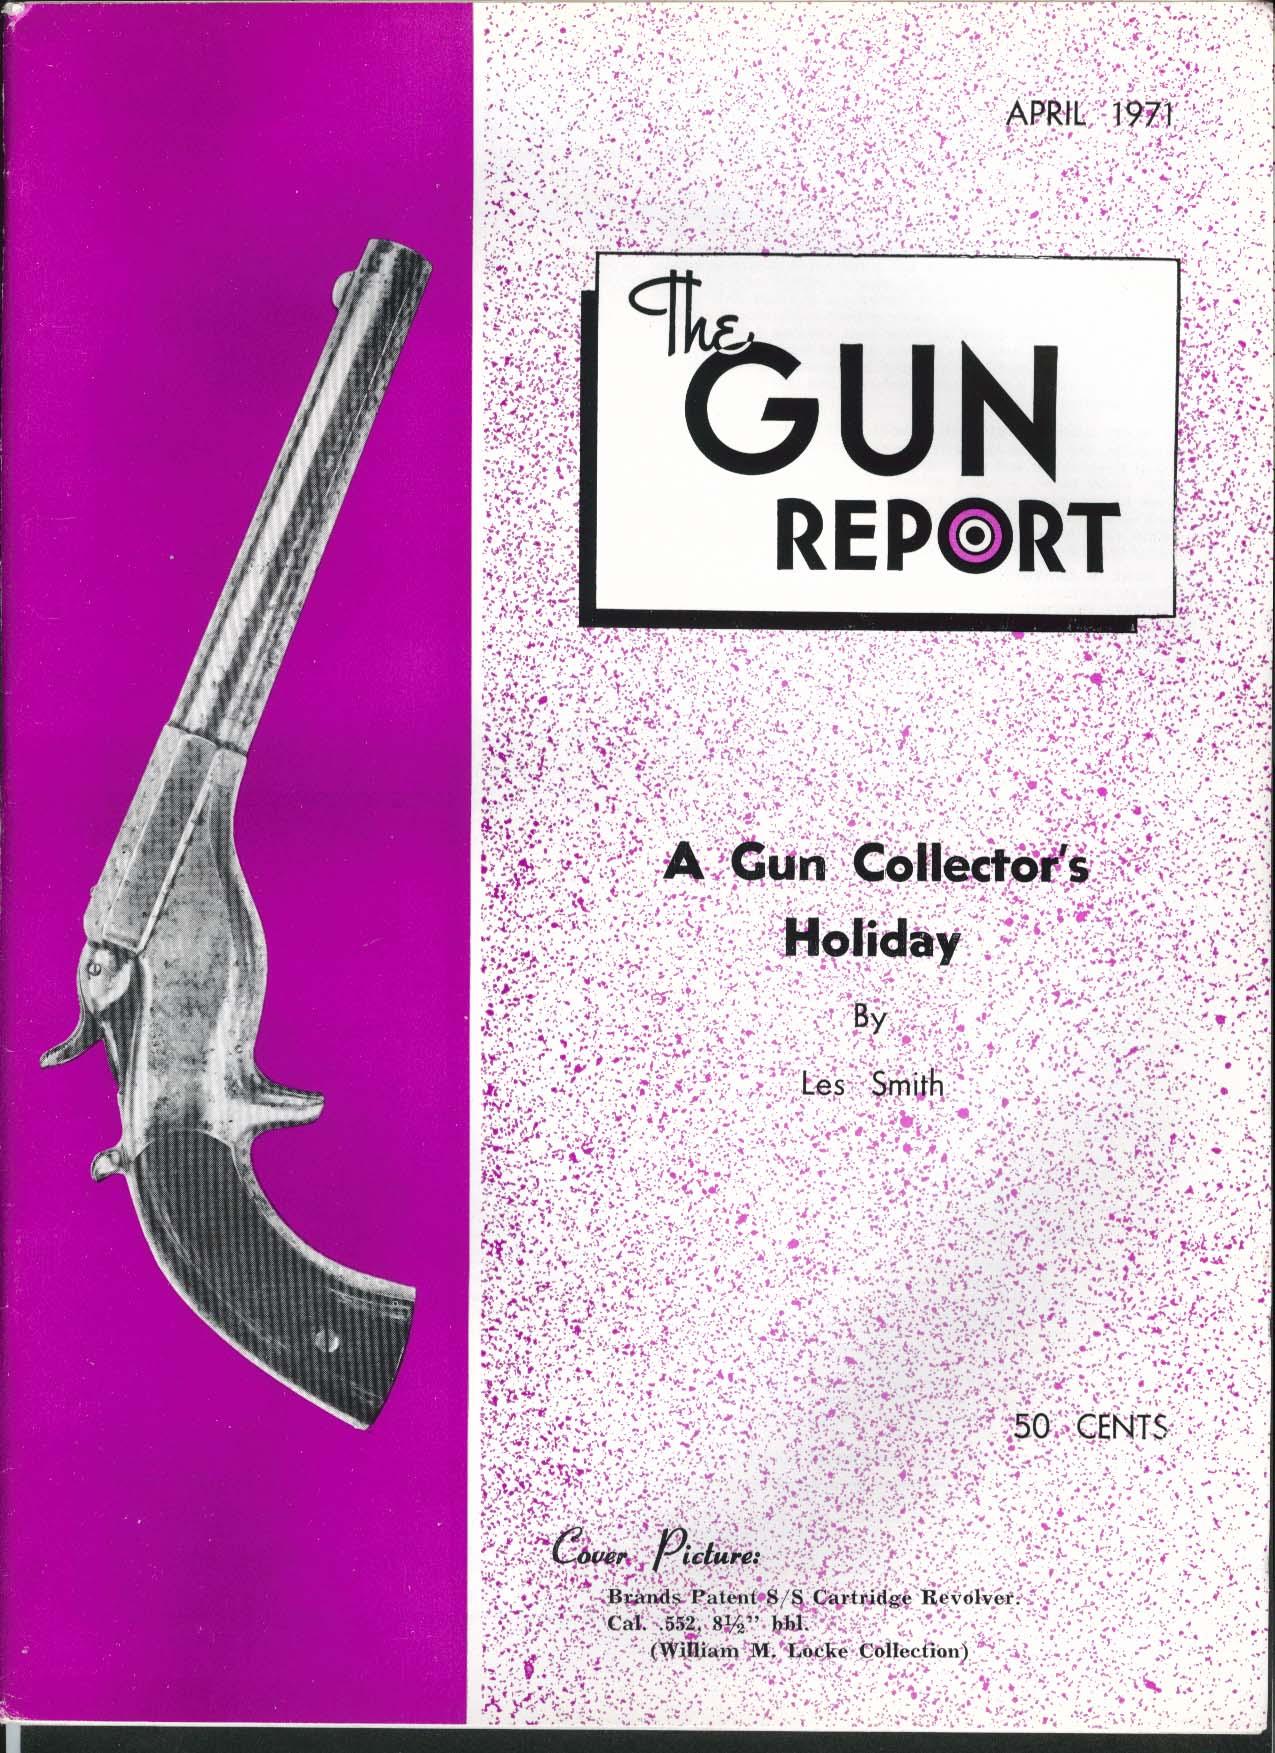 GUN REPORT Brands Patent S/S Cartridge Revolver 1861 1862 Rifle Musket + 4 1971